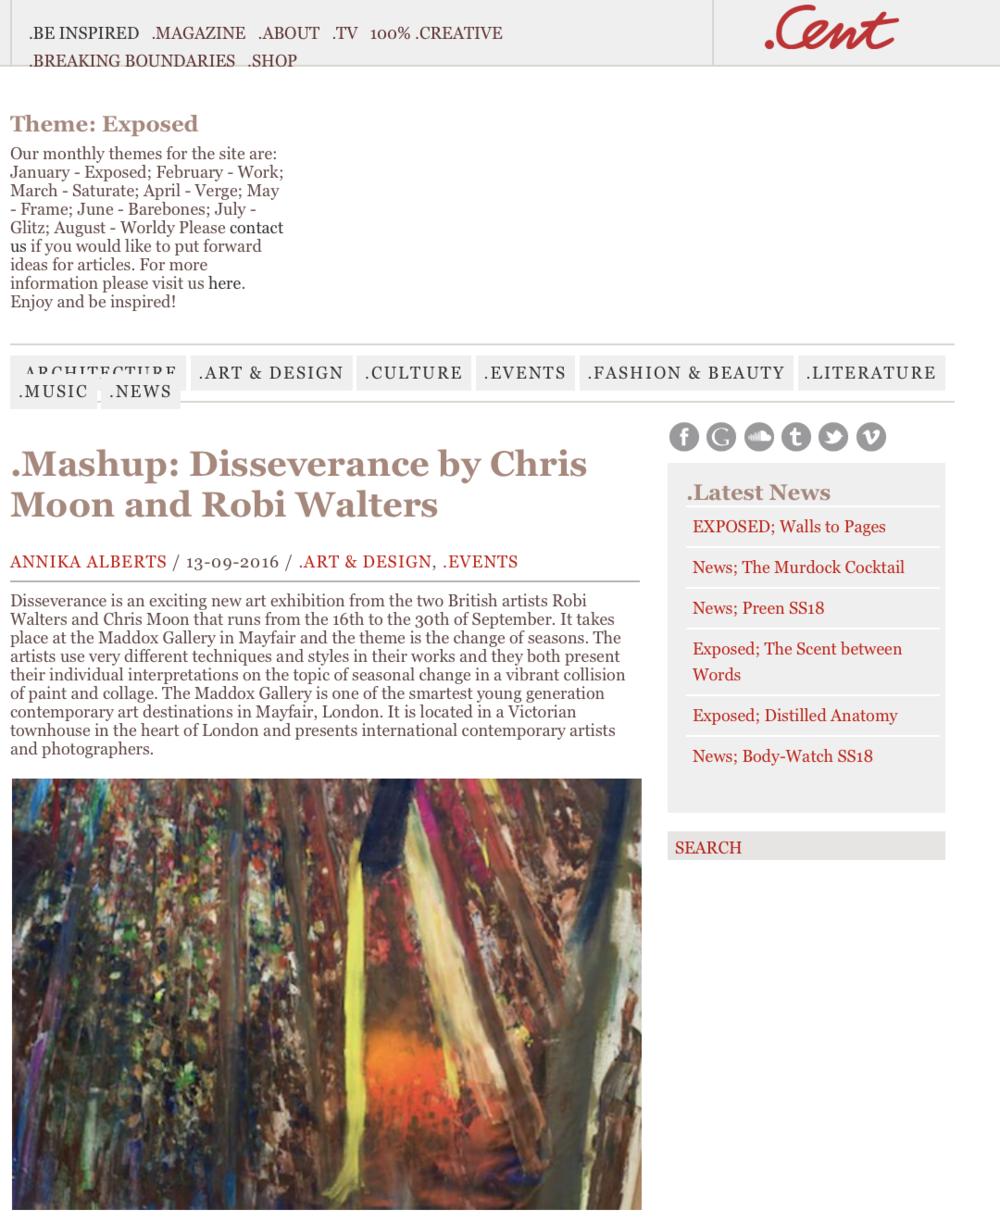 CentMagazine_Robi_walters